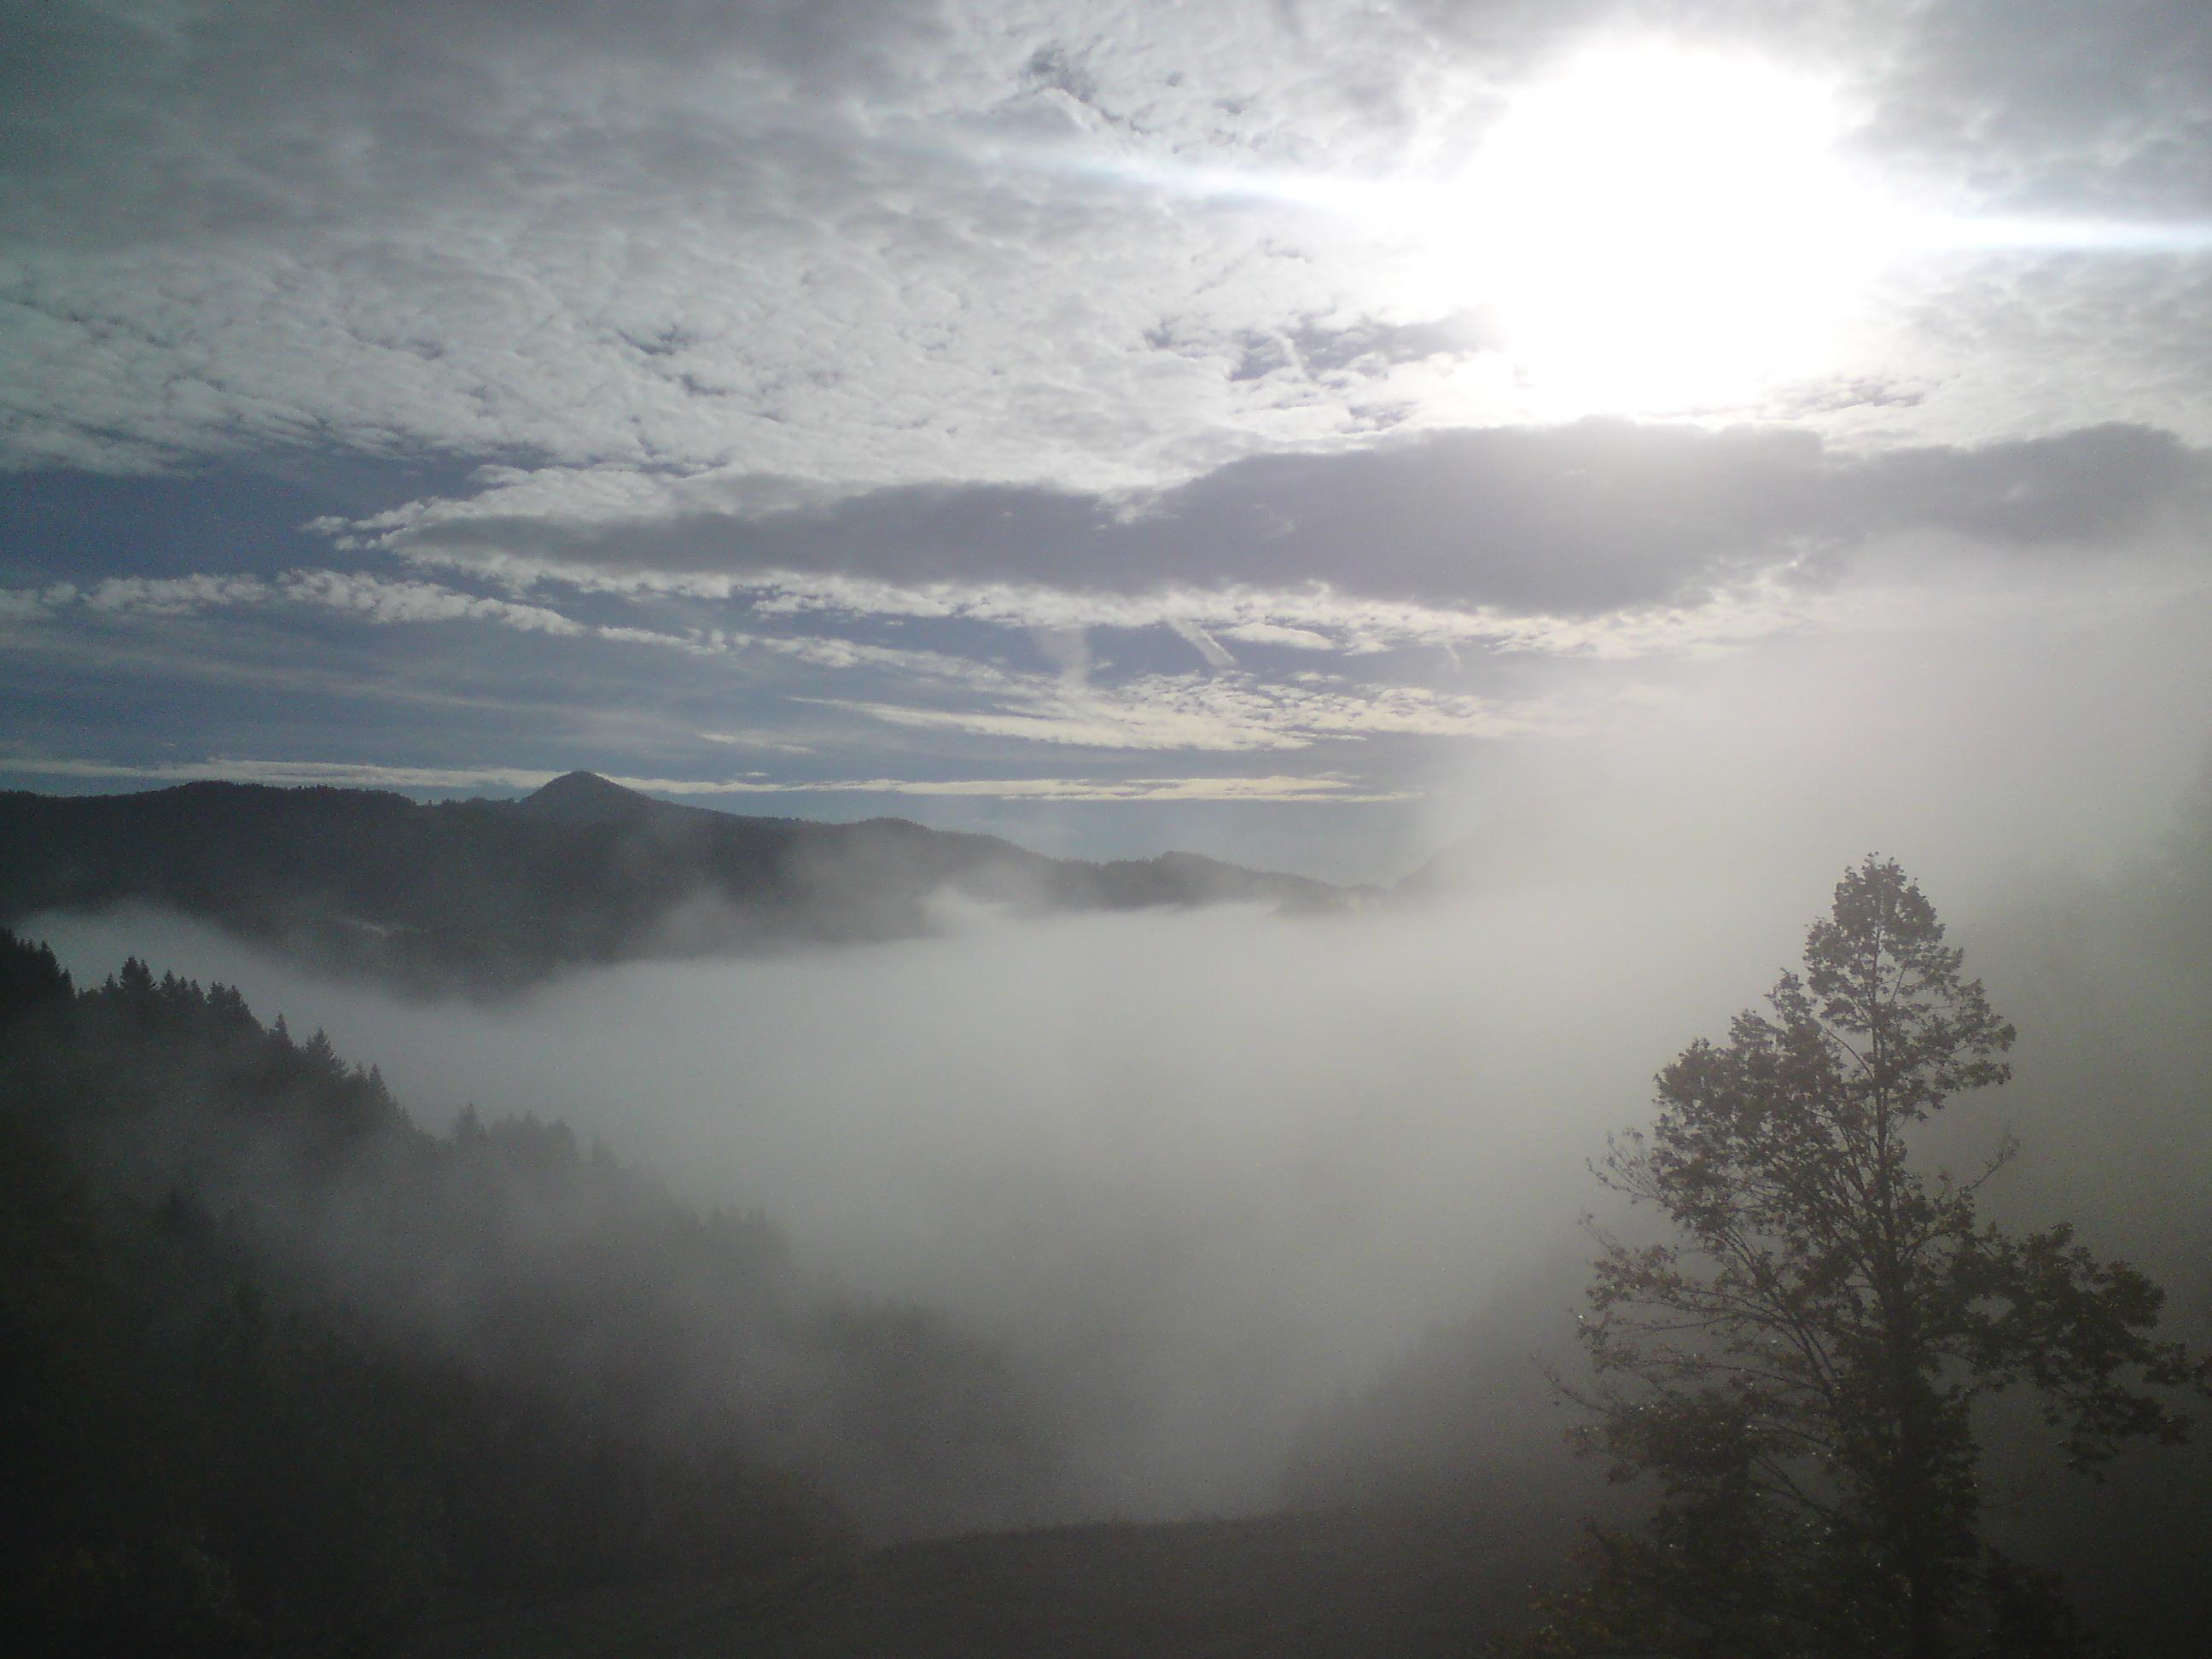 Blind im Nebel